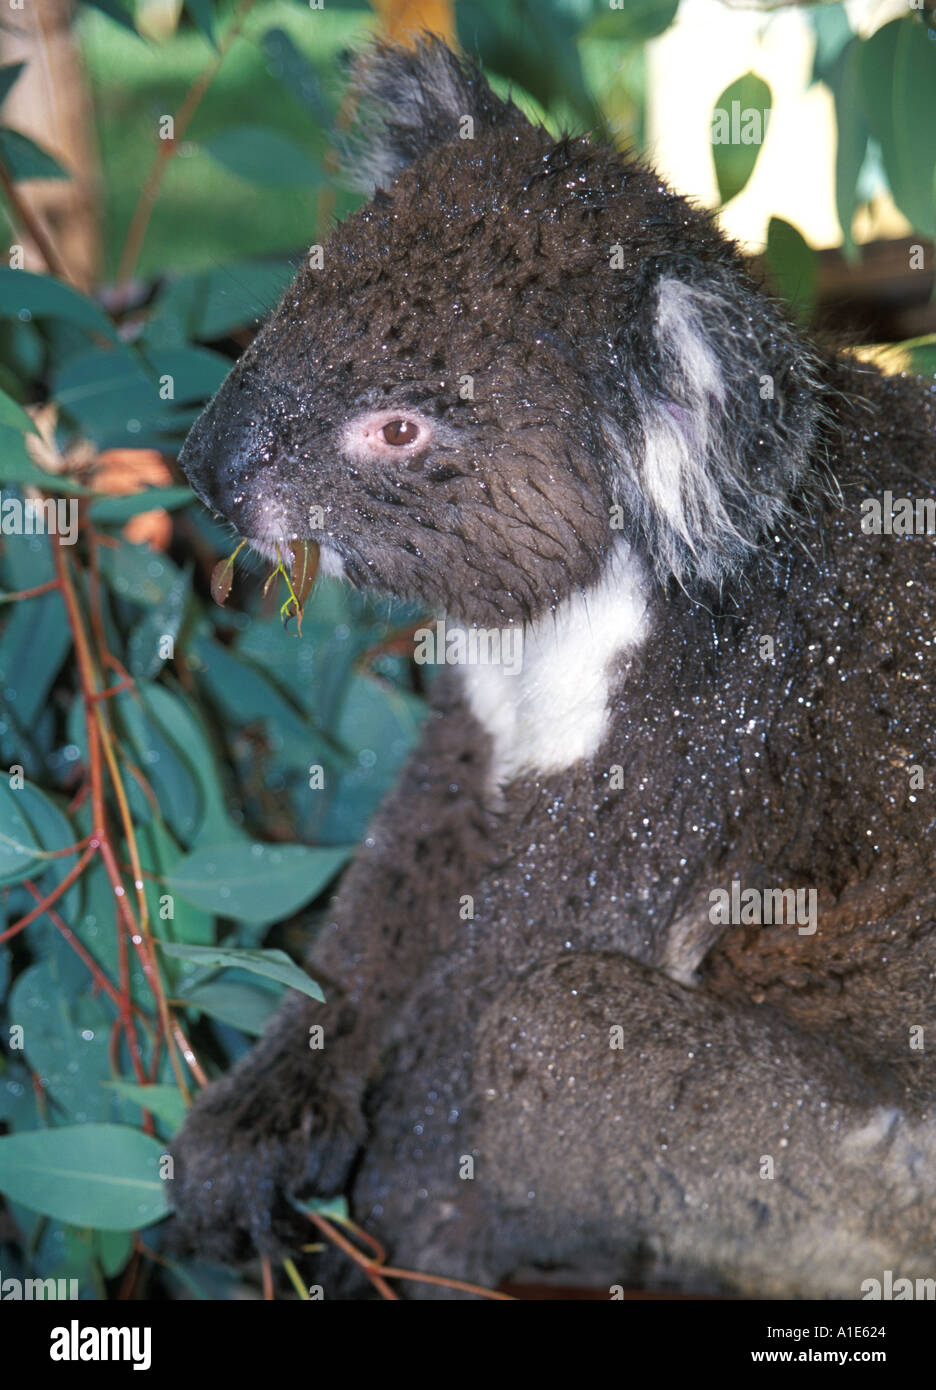 Nasse Koalas